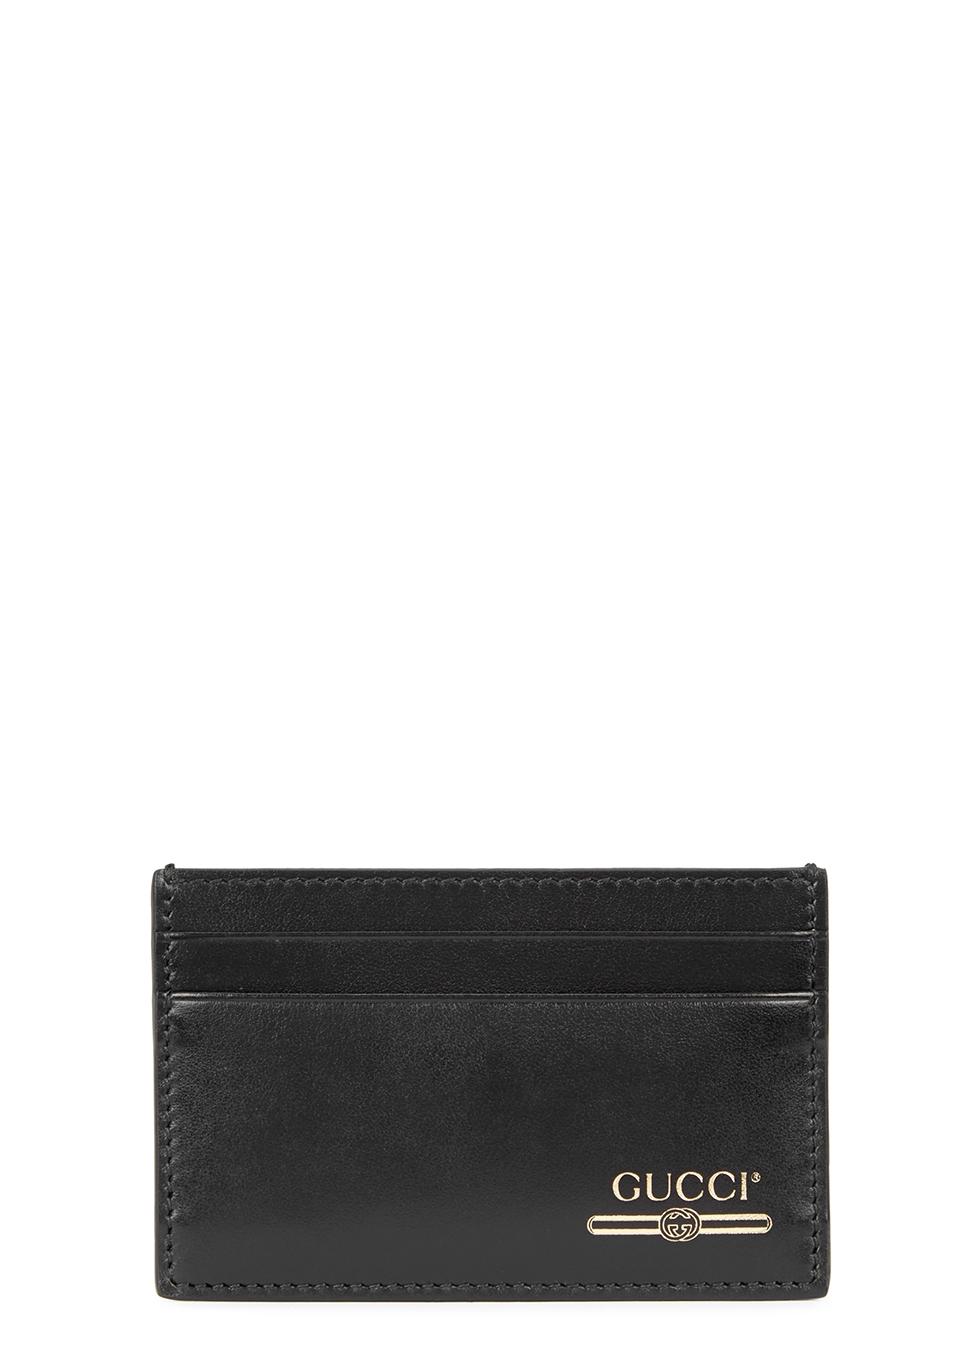 Designer Card Holders , Small Leathers , Harvey Nichols